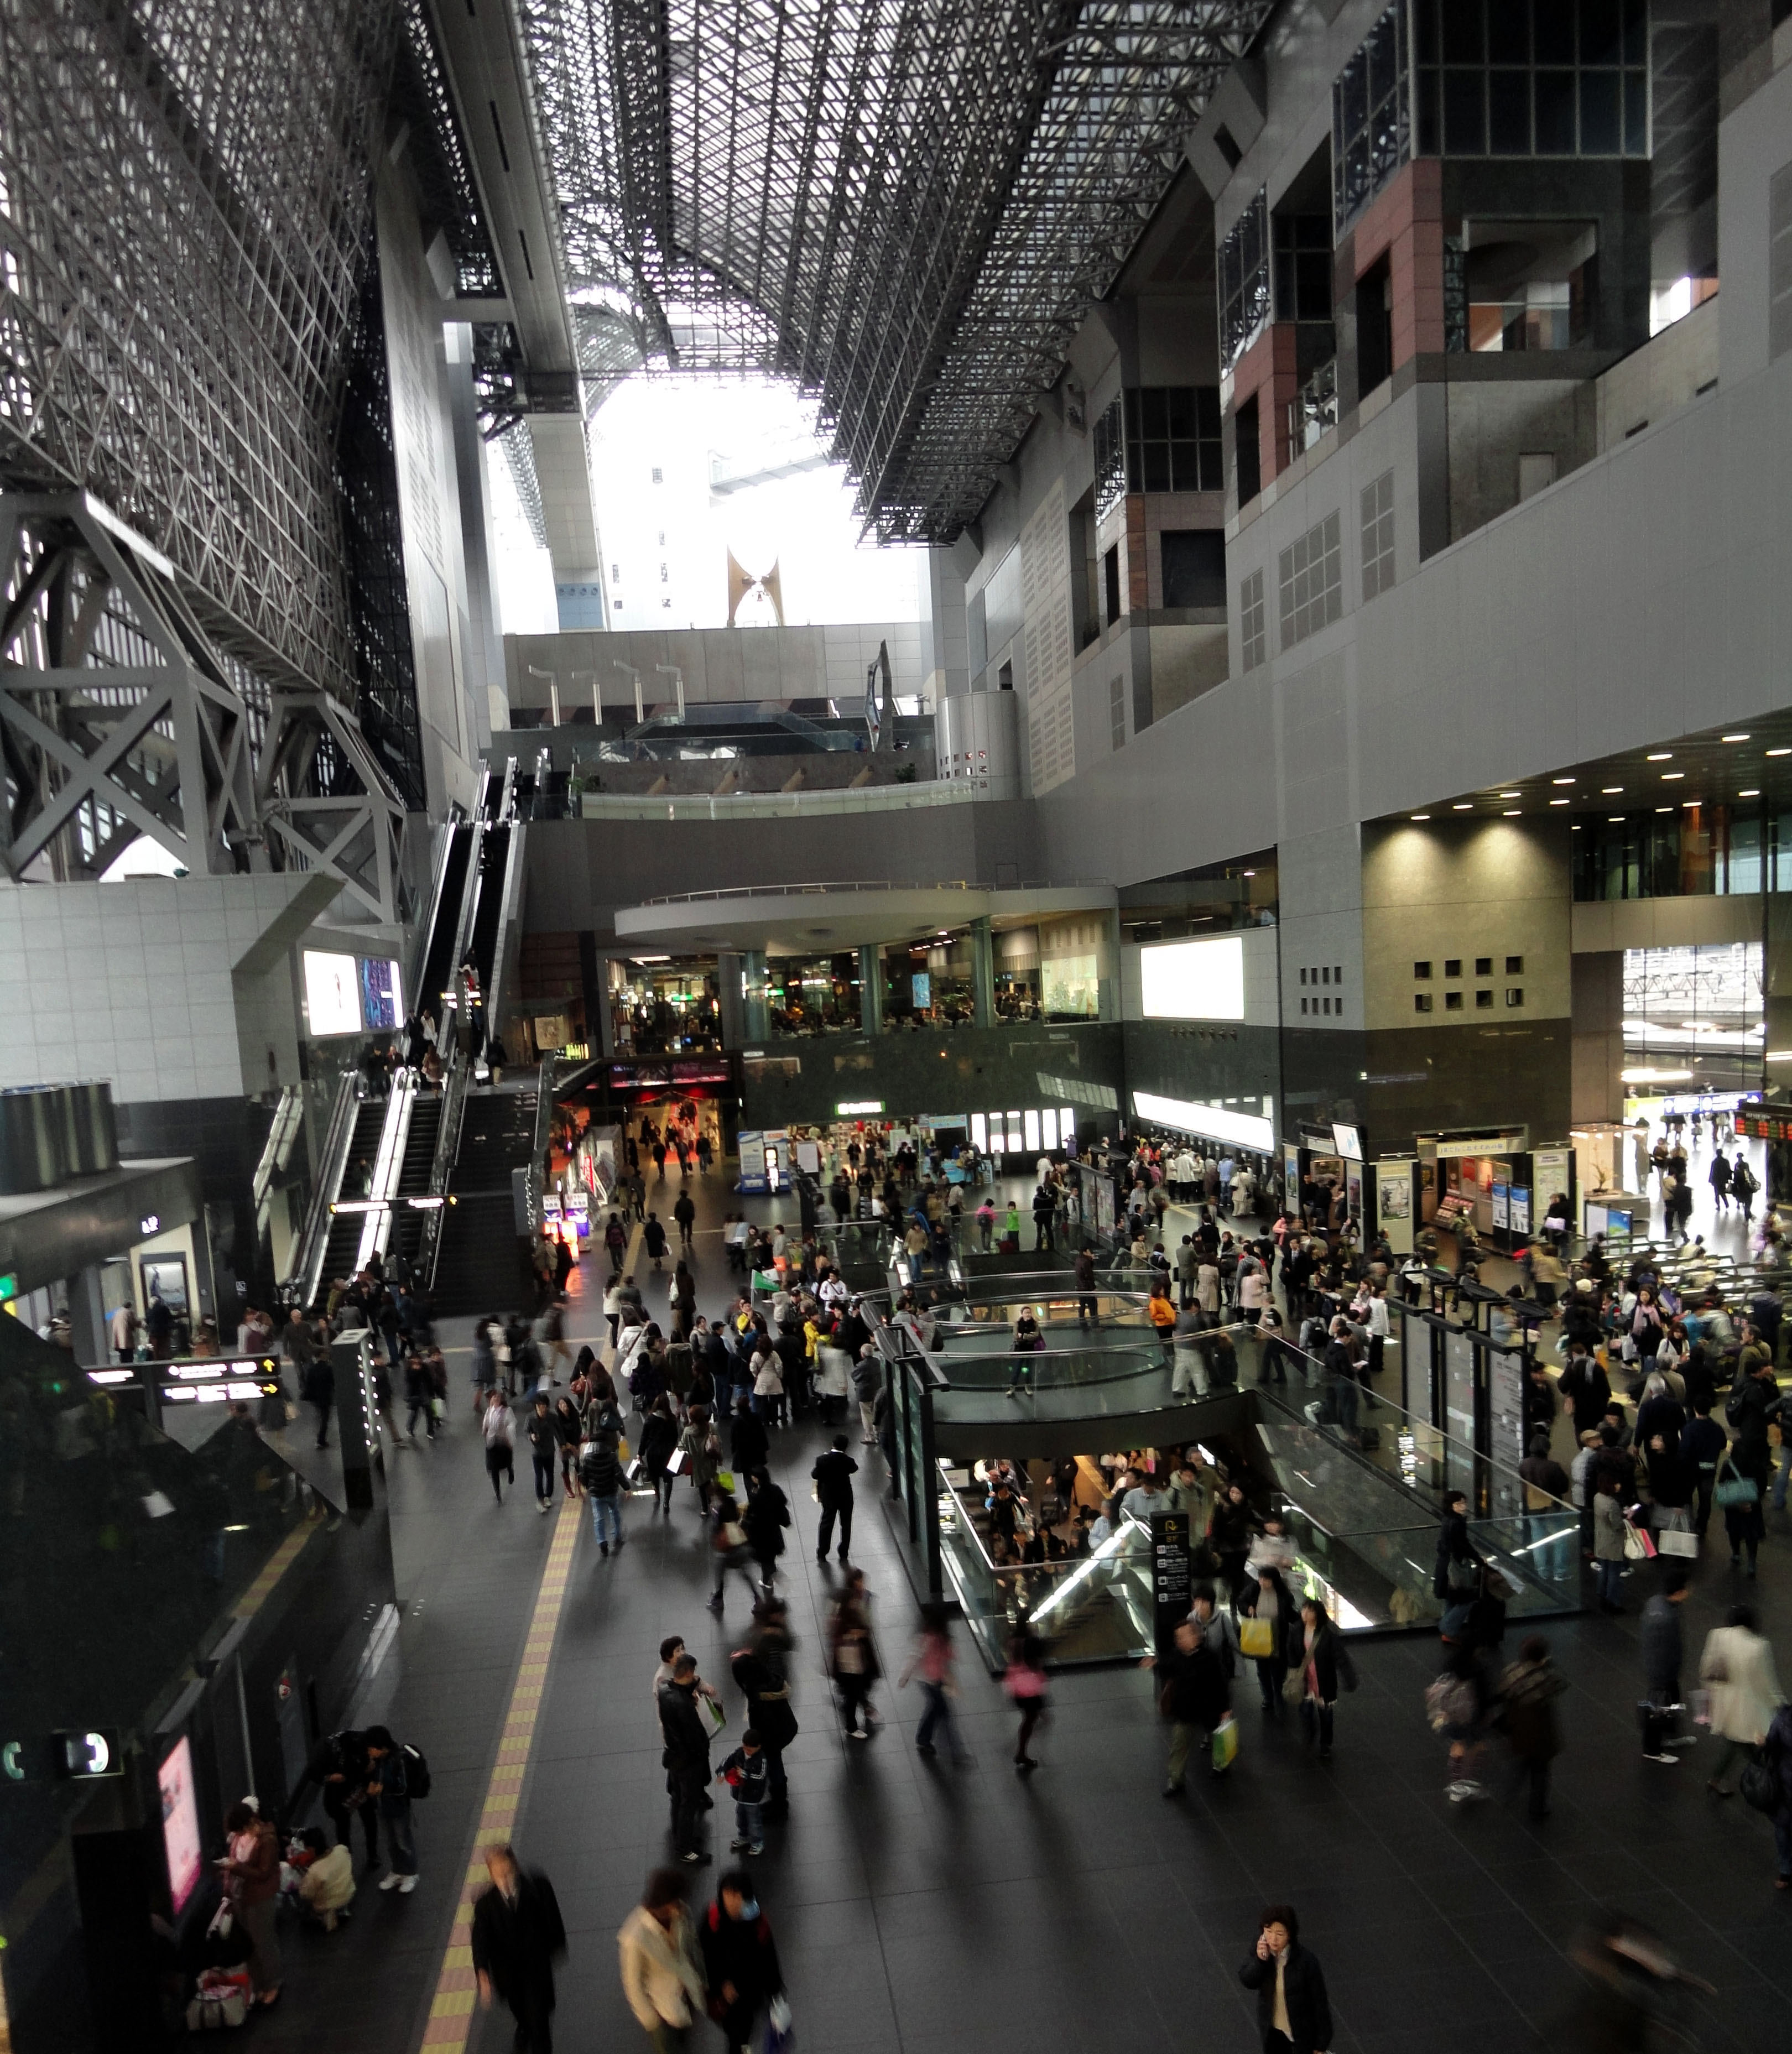 Asisbiz Photo S Of Kyoto Station 京都駅 Kyōto Eki Kyoto